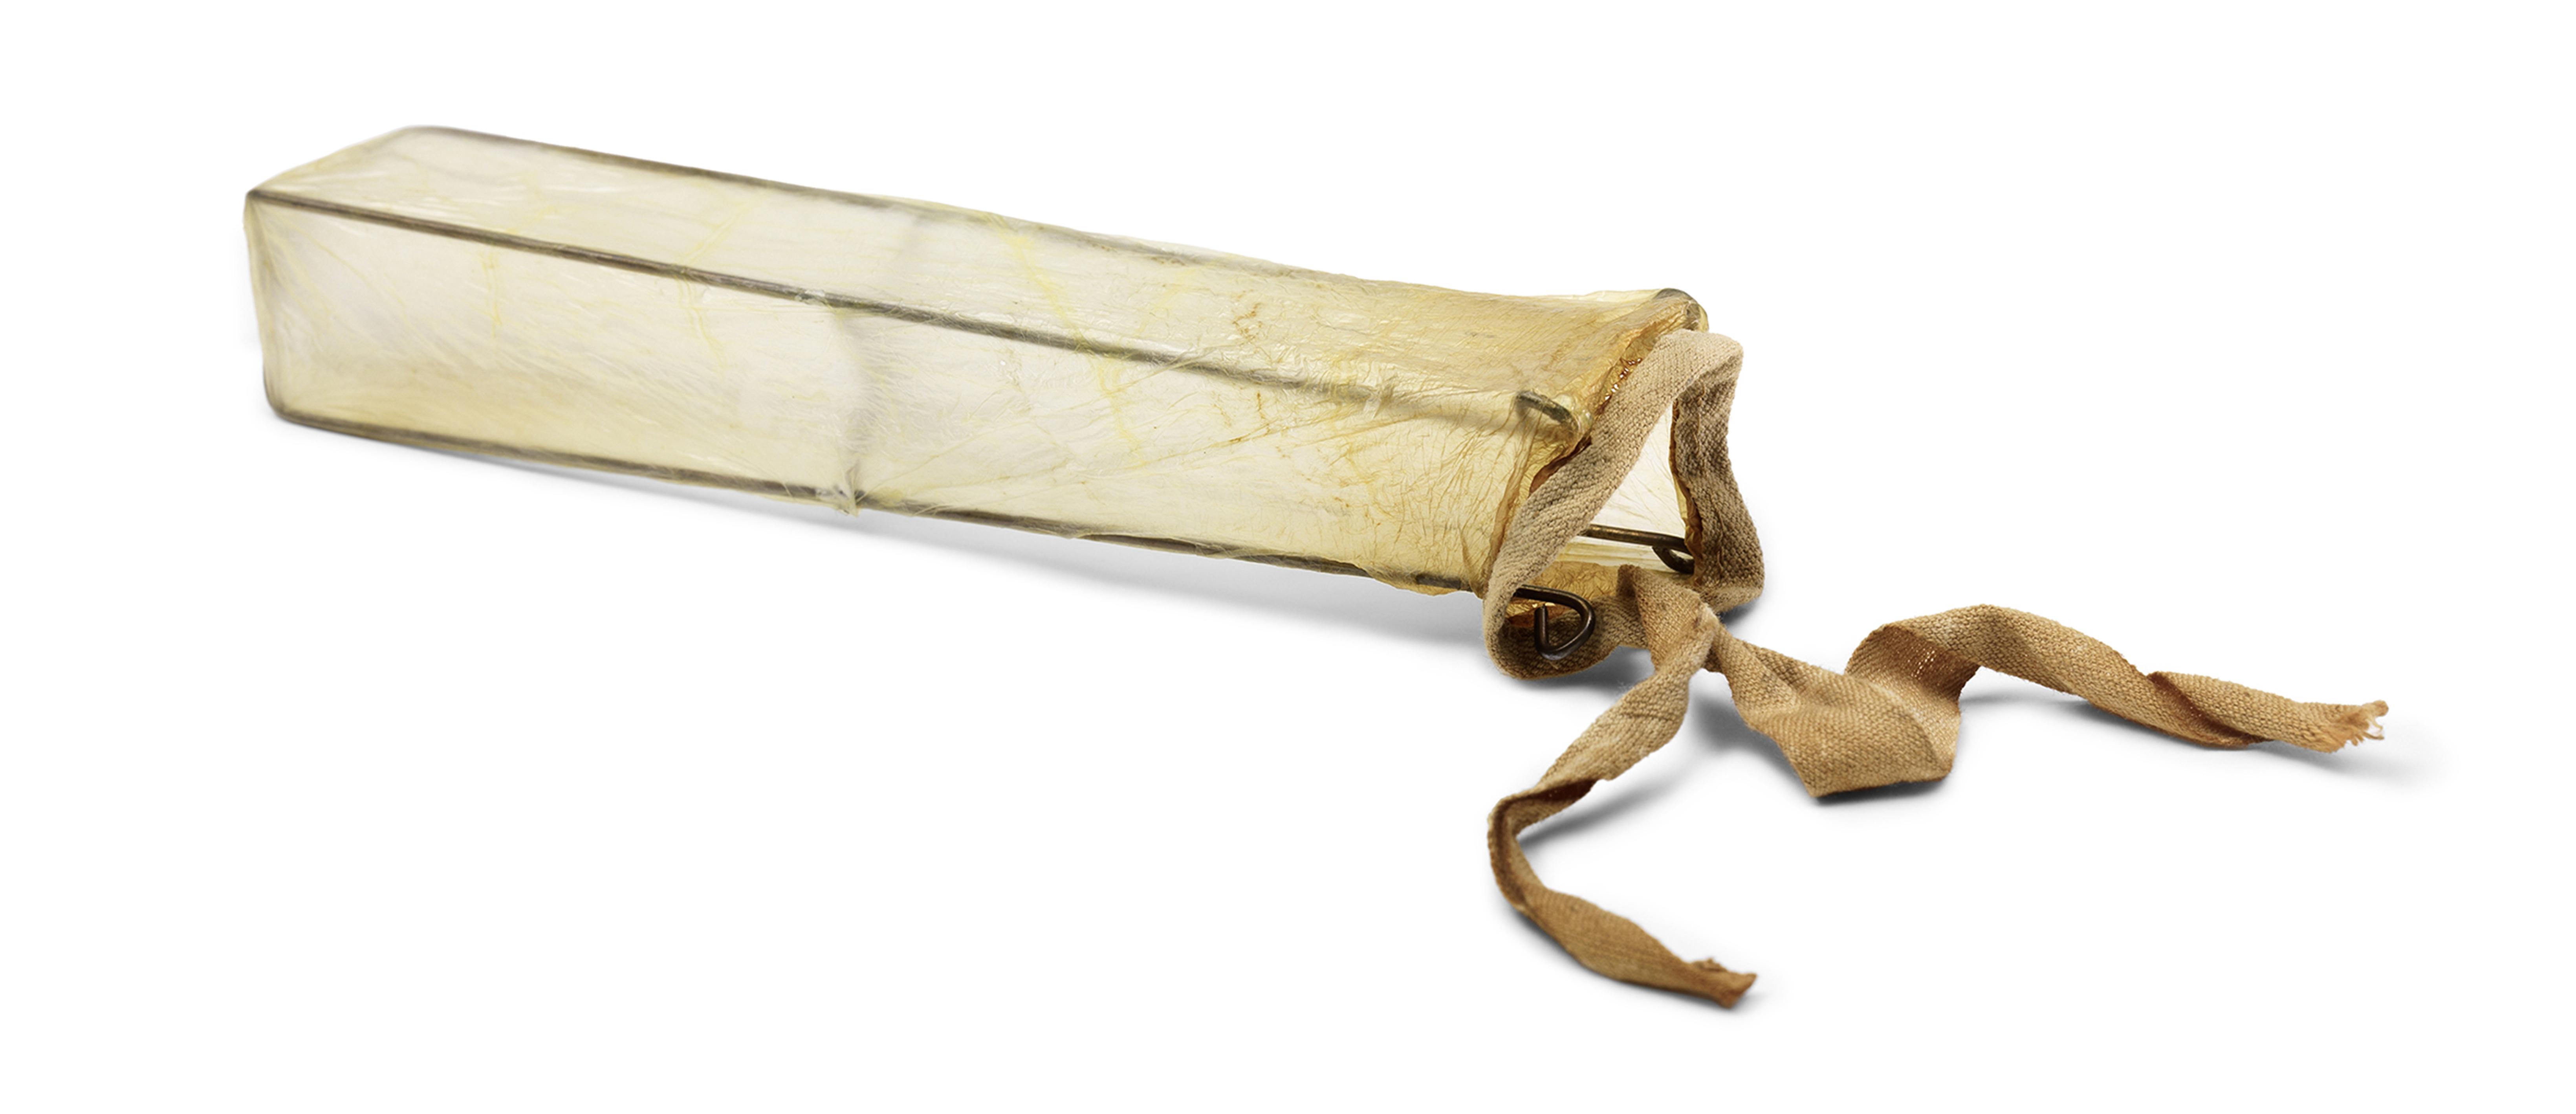 Condón hecho con intestino de oveja, 1800.